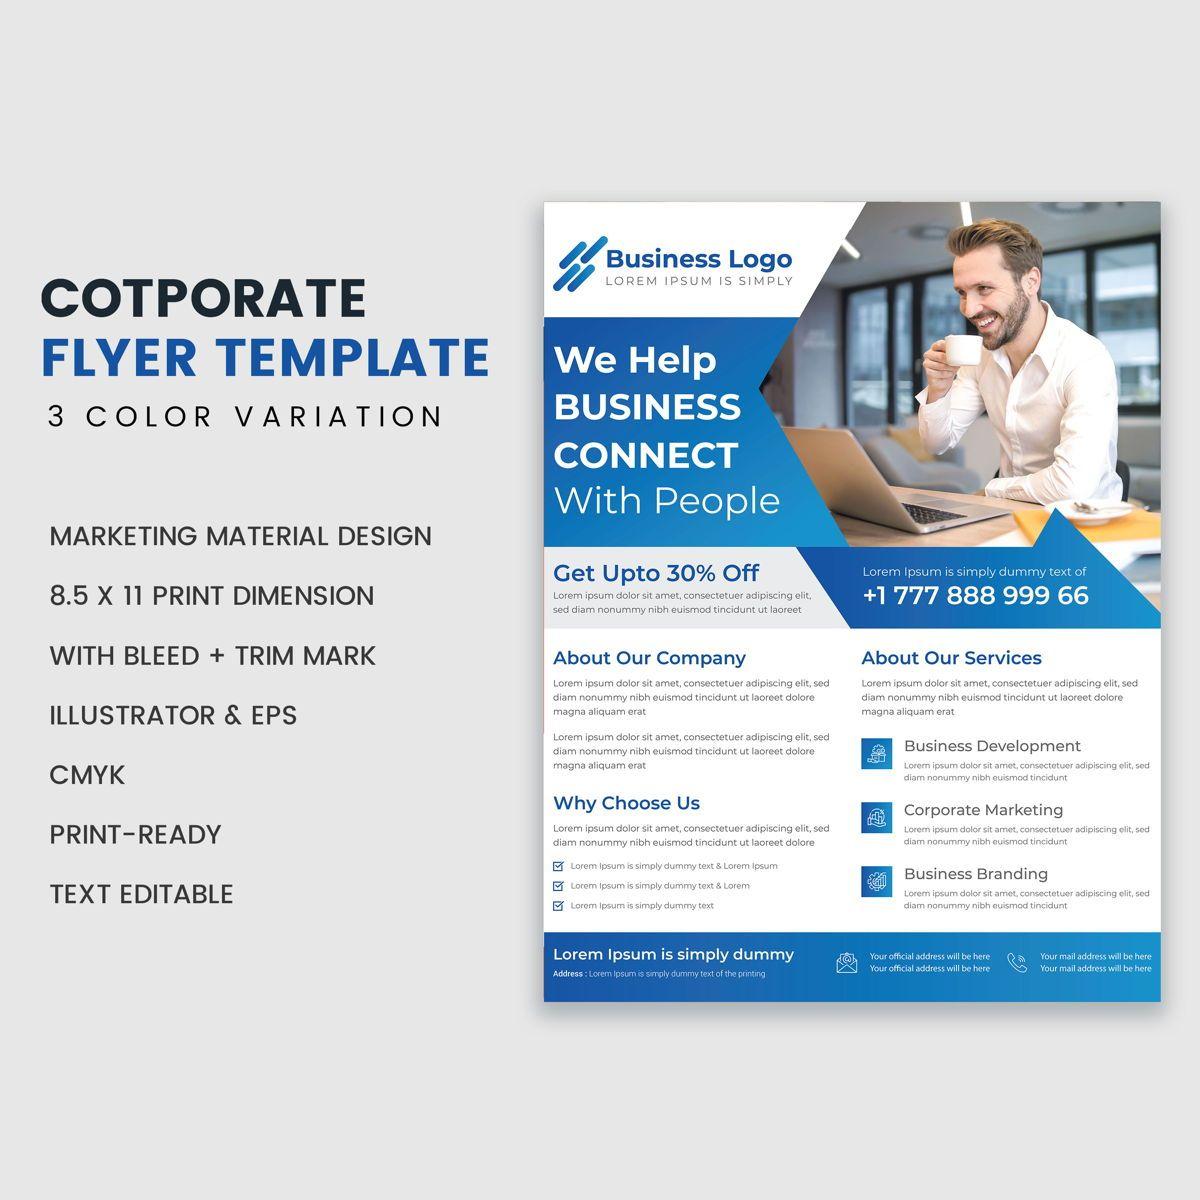 Minimal Corporate Flyer Template Design, Diapositive 2, 08946, Art & Entertainment — PoweredTemplate.com